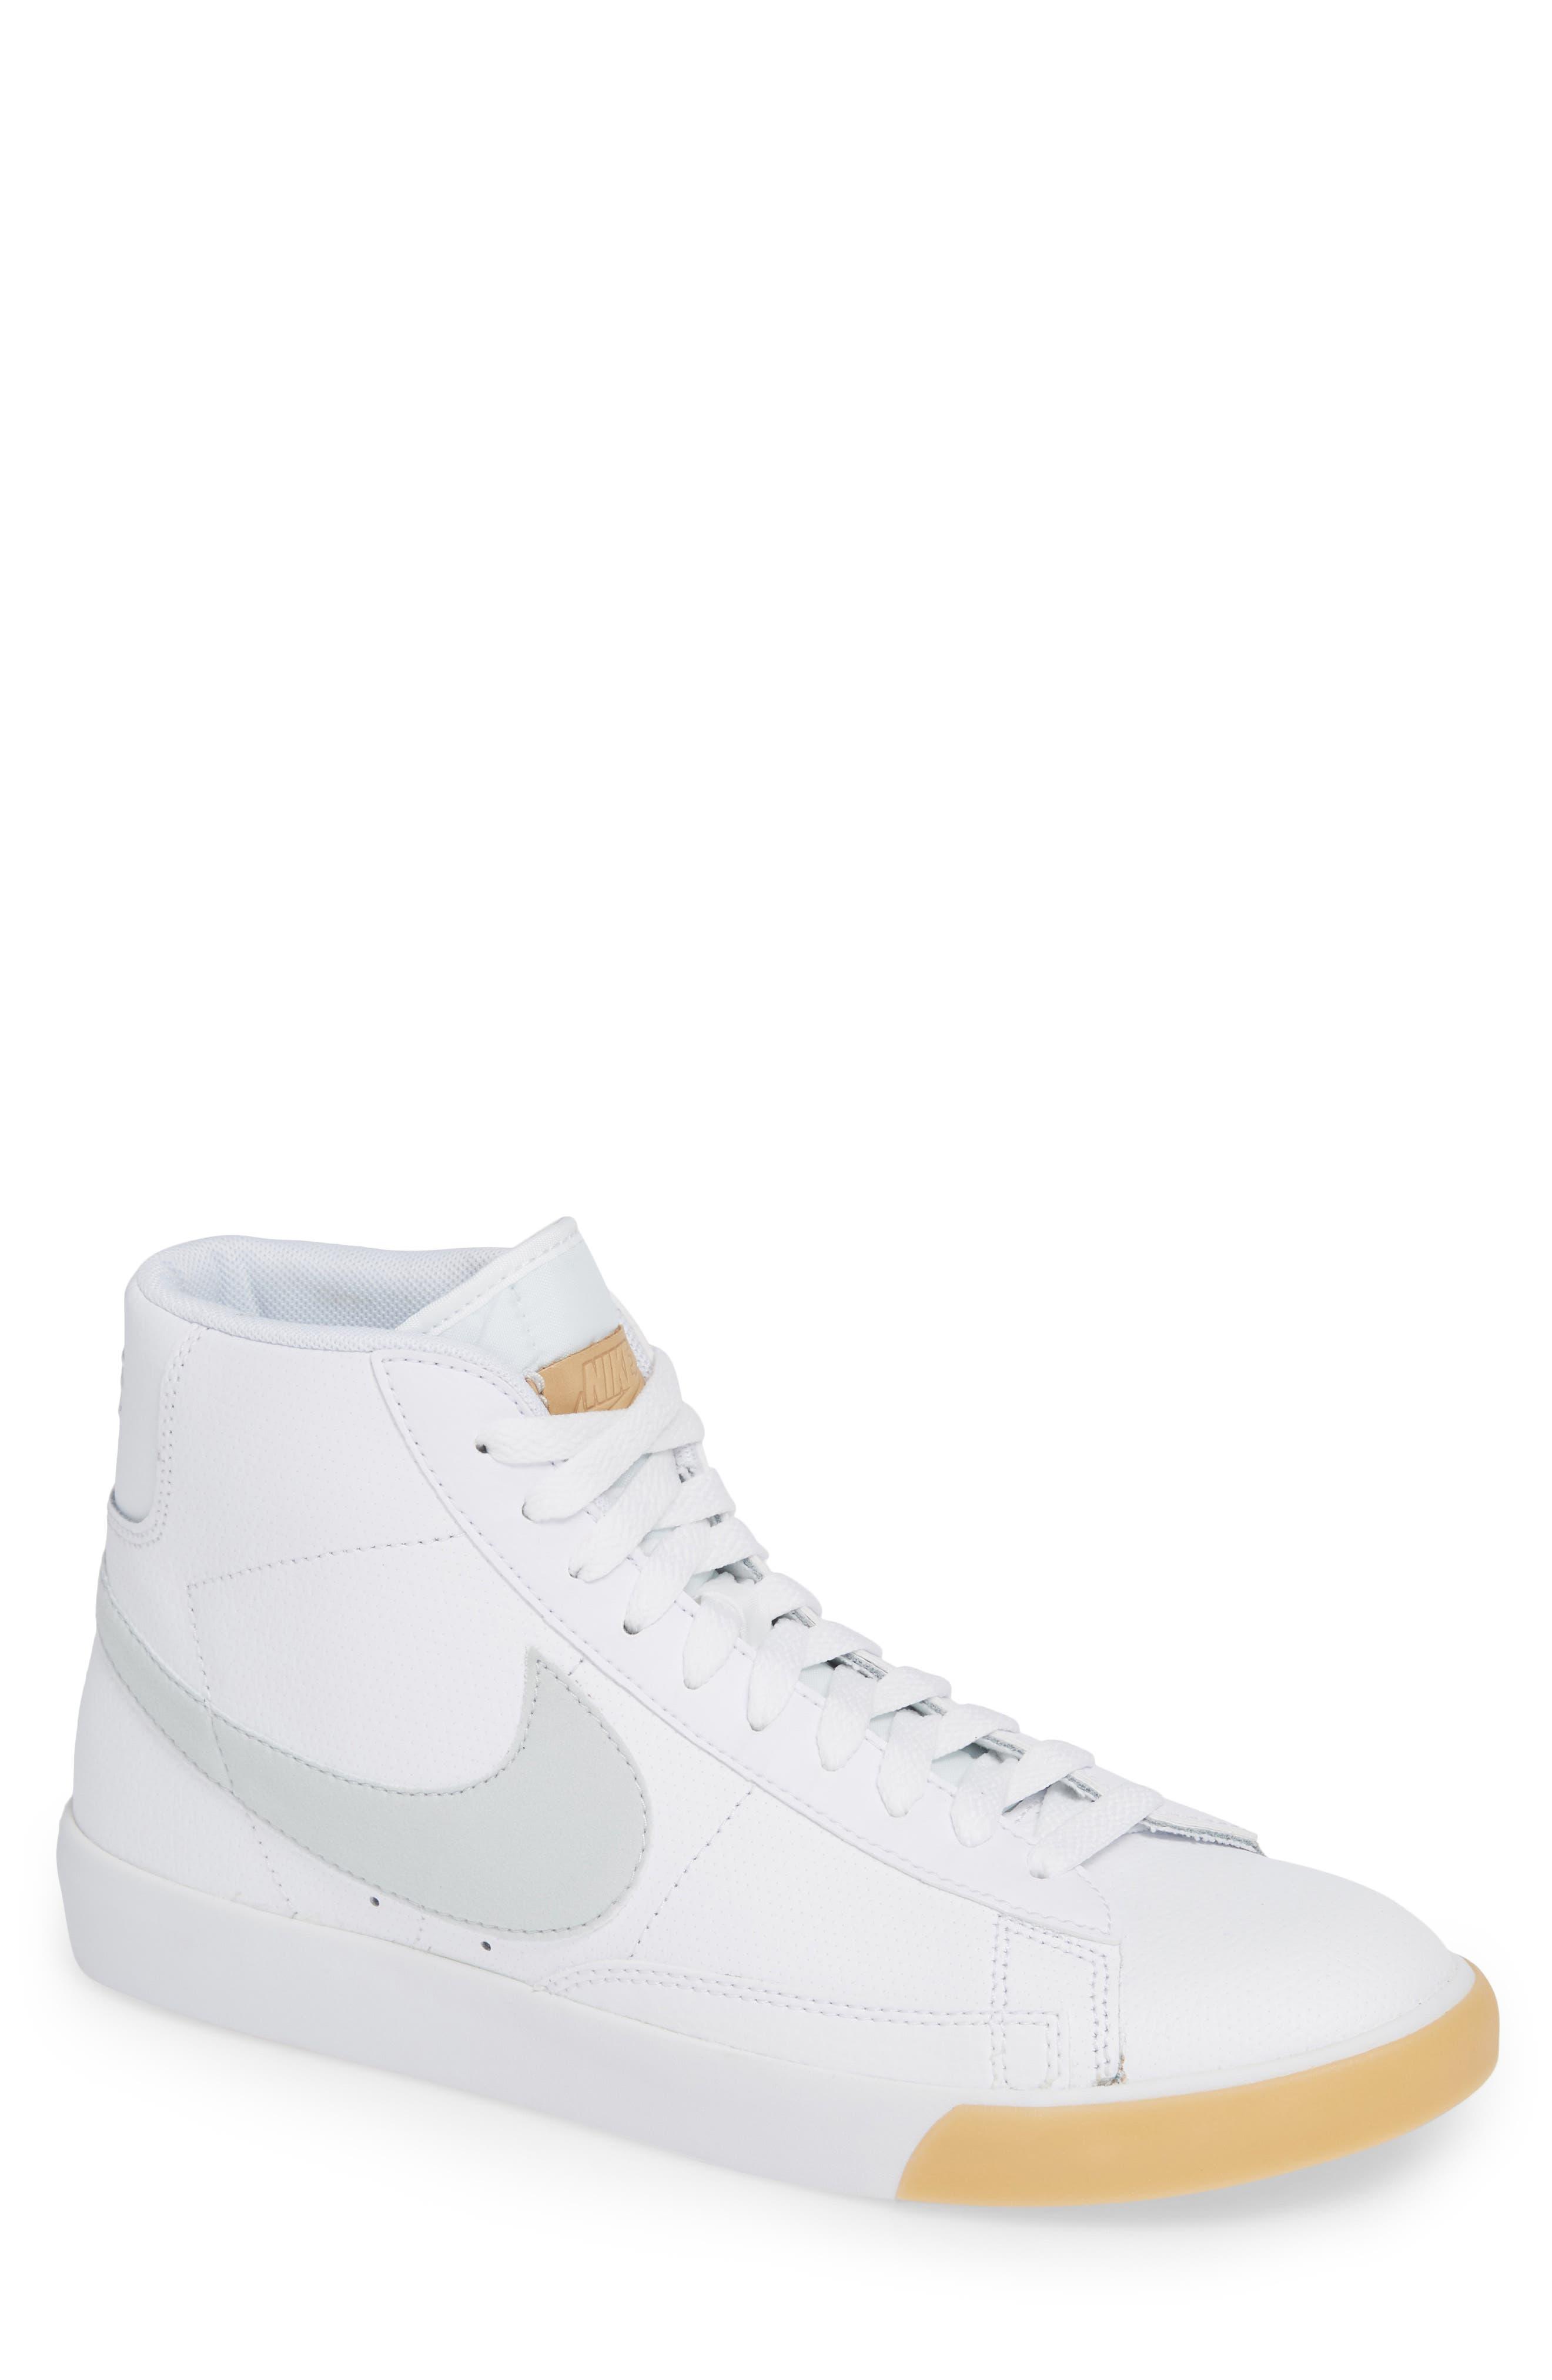 Blazer Mid Sneaker,                         Main,                         color,